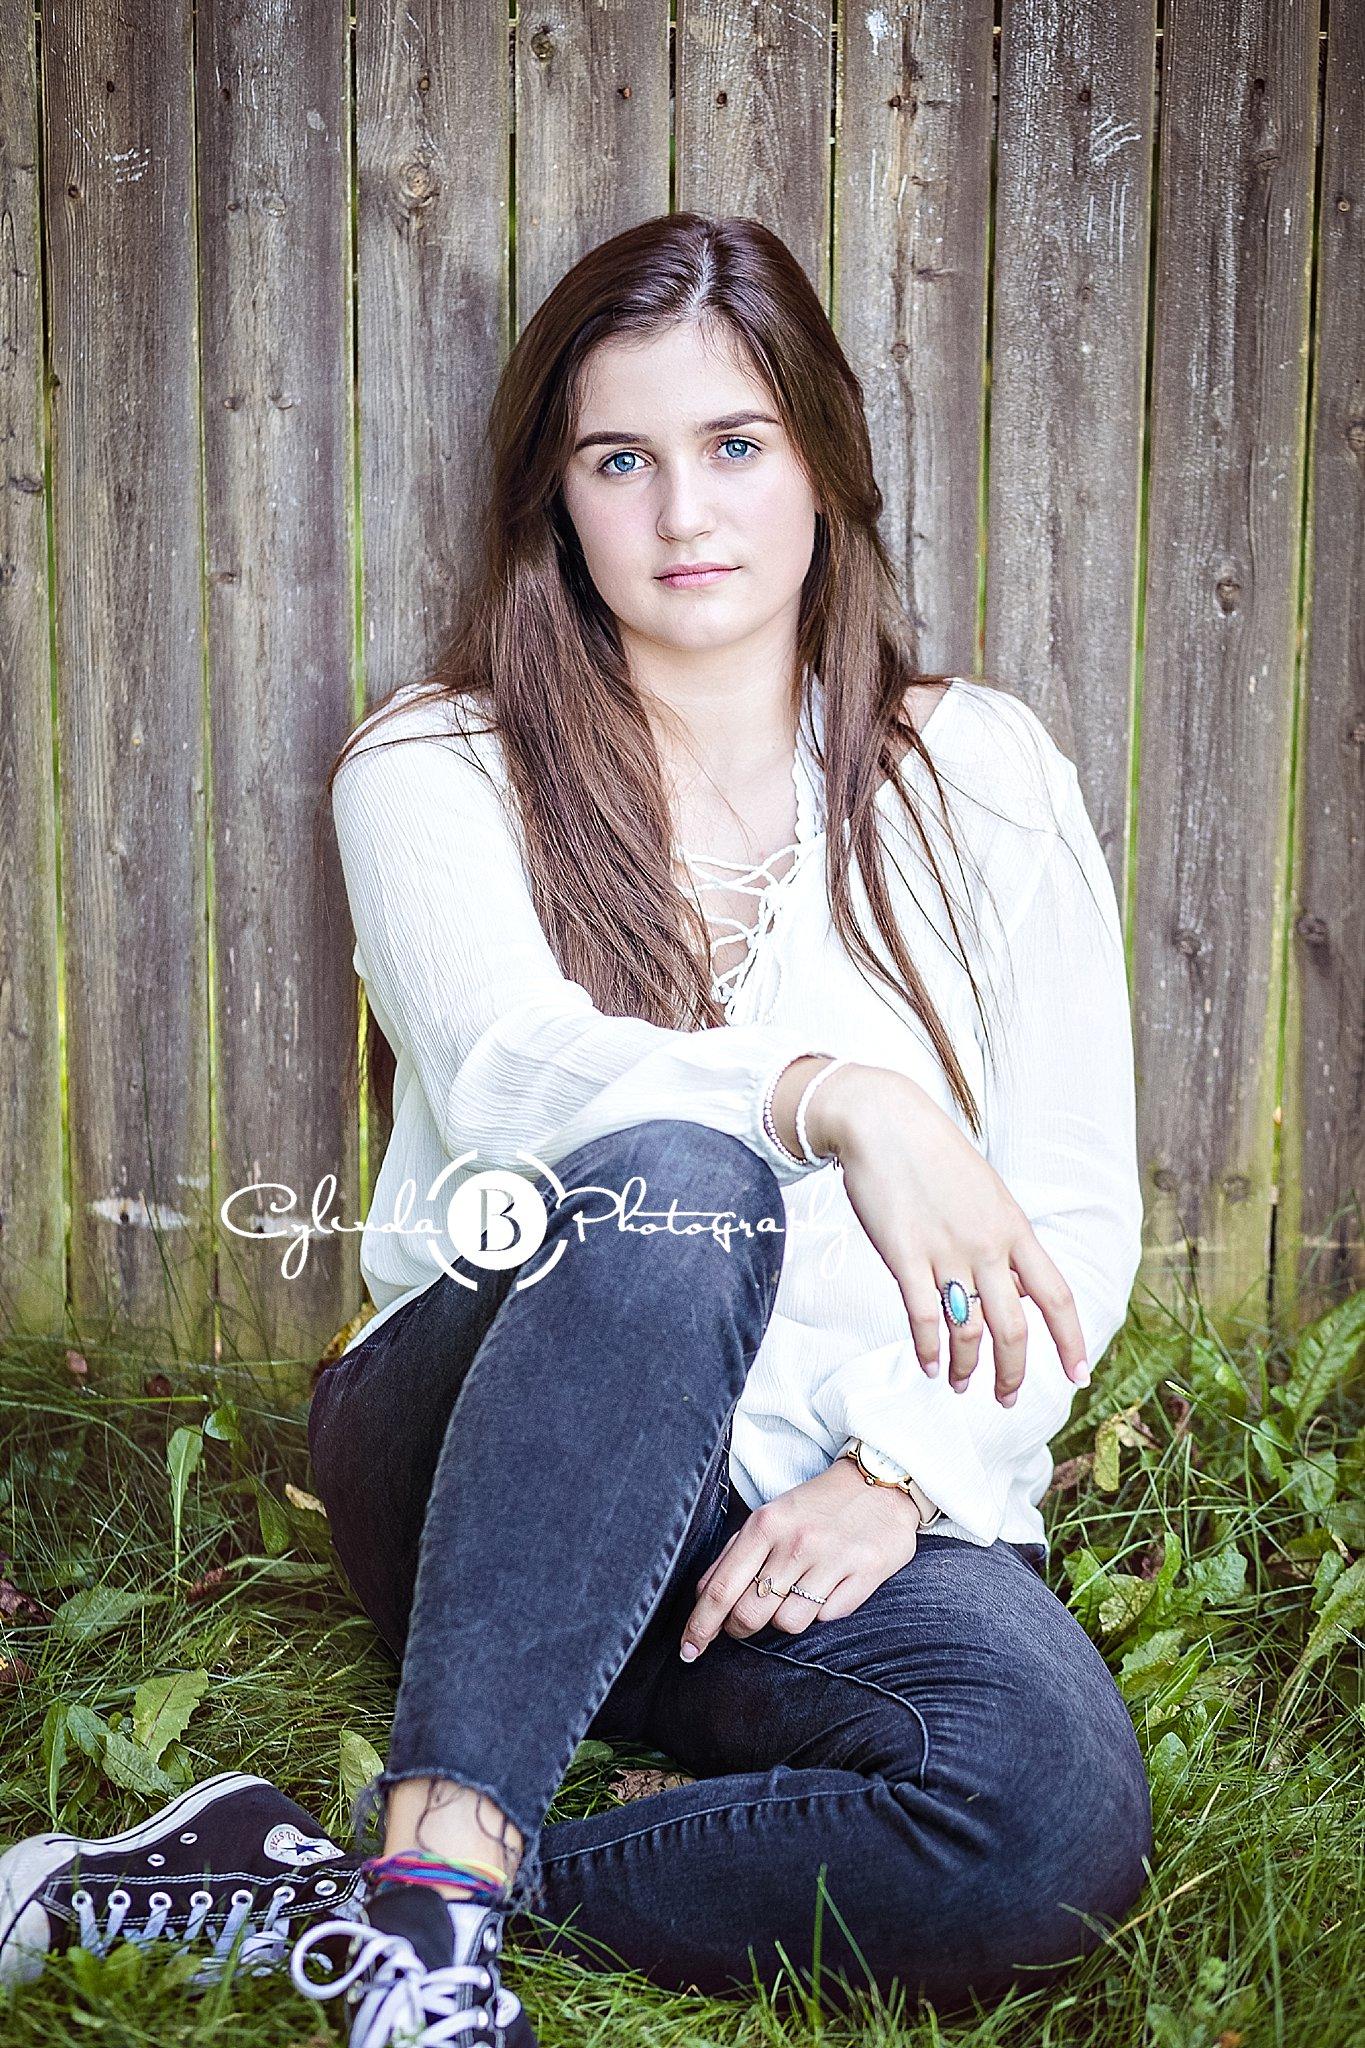 High School Senior Girl